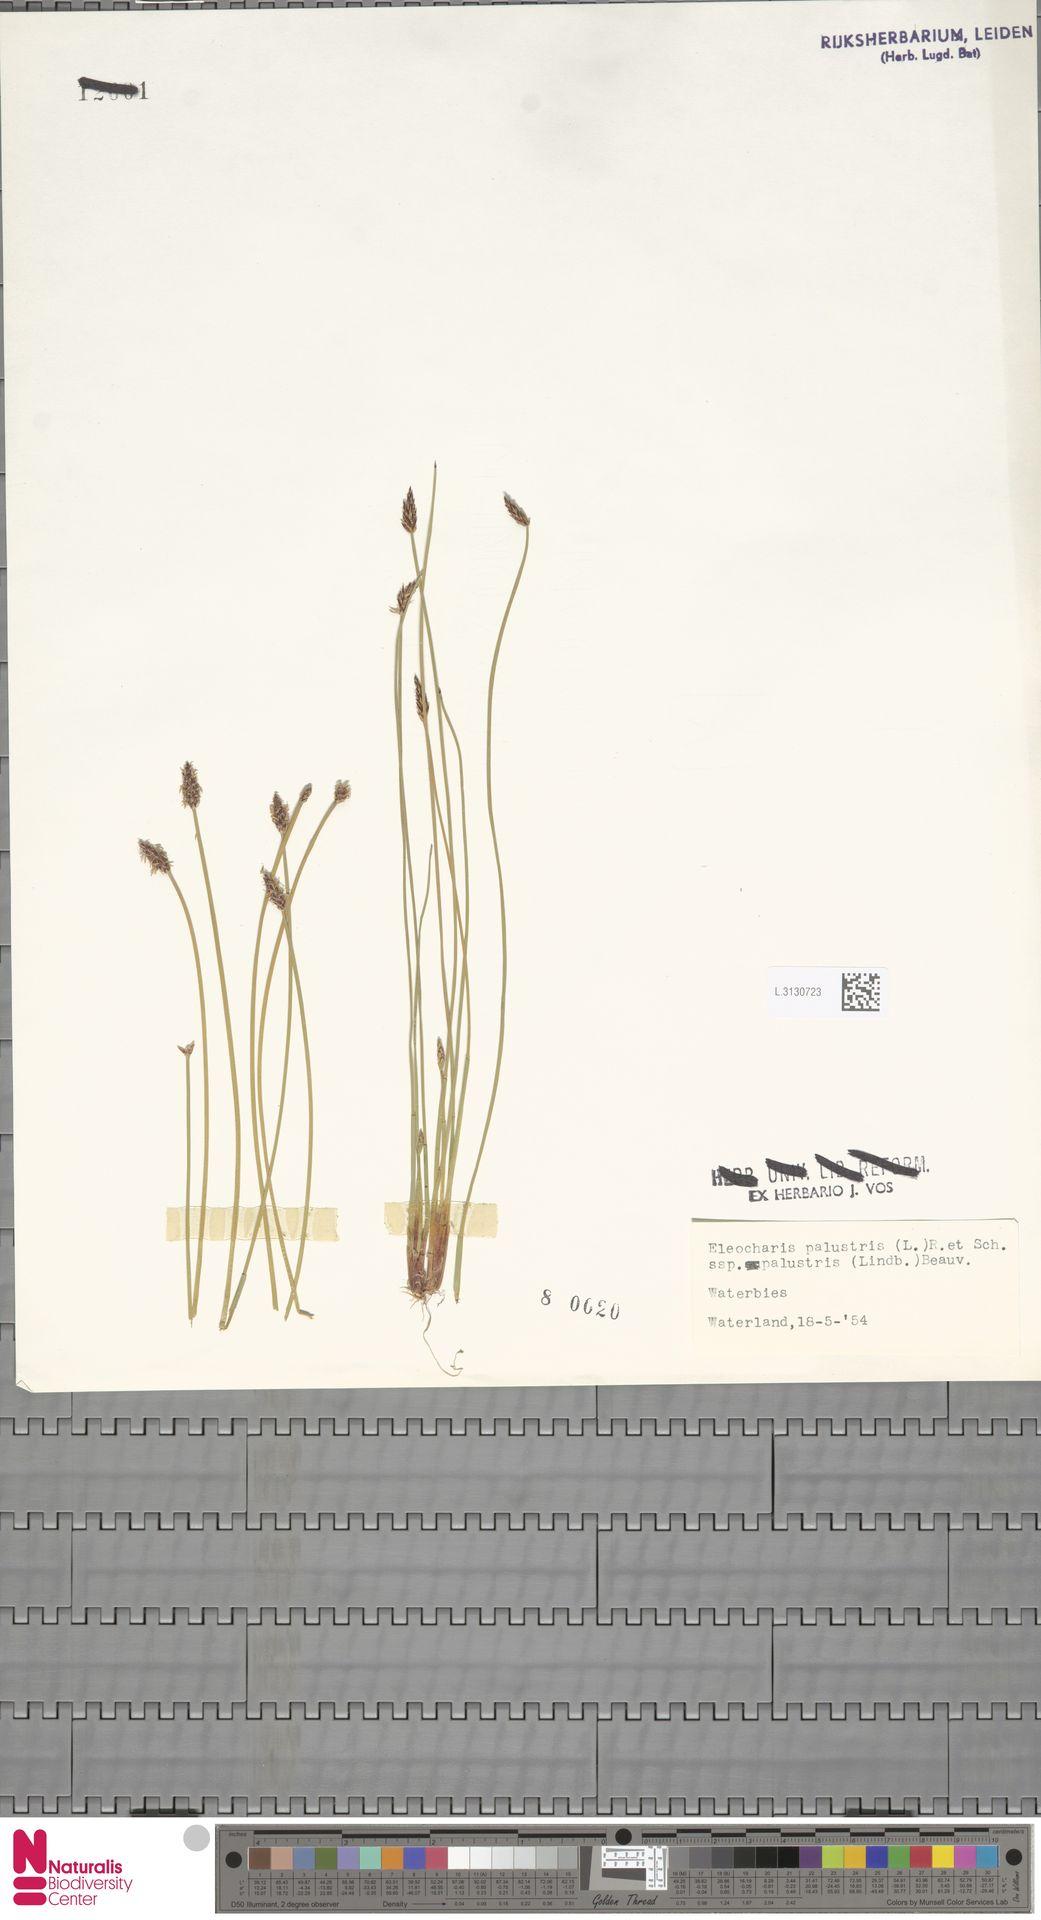 L.3130723 | Eleocharis palustris subsp. palustris